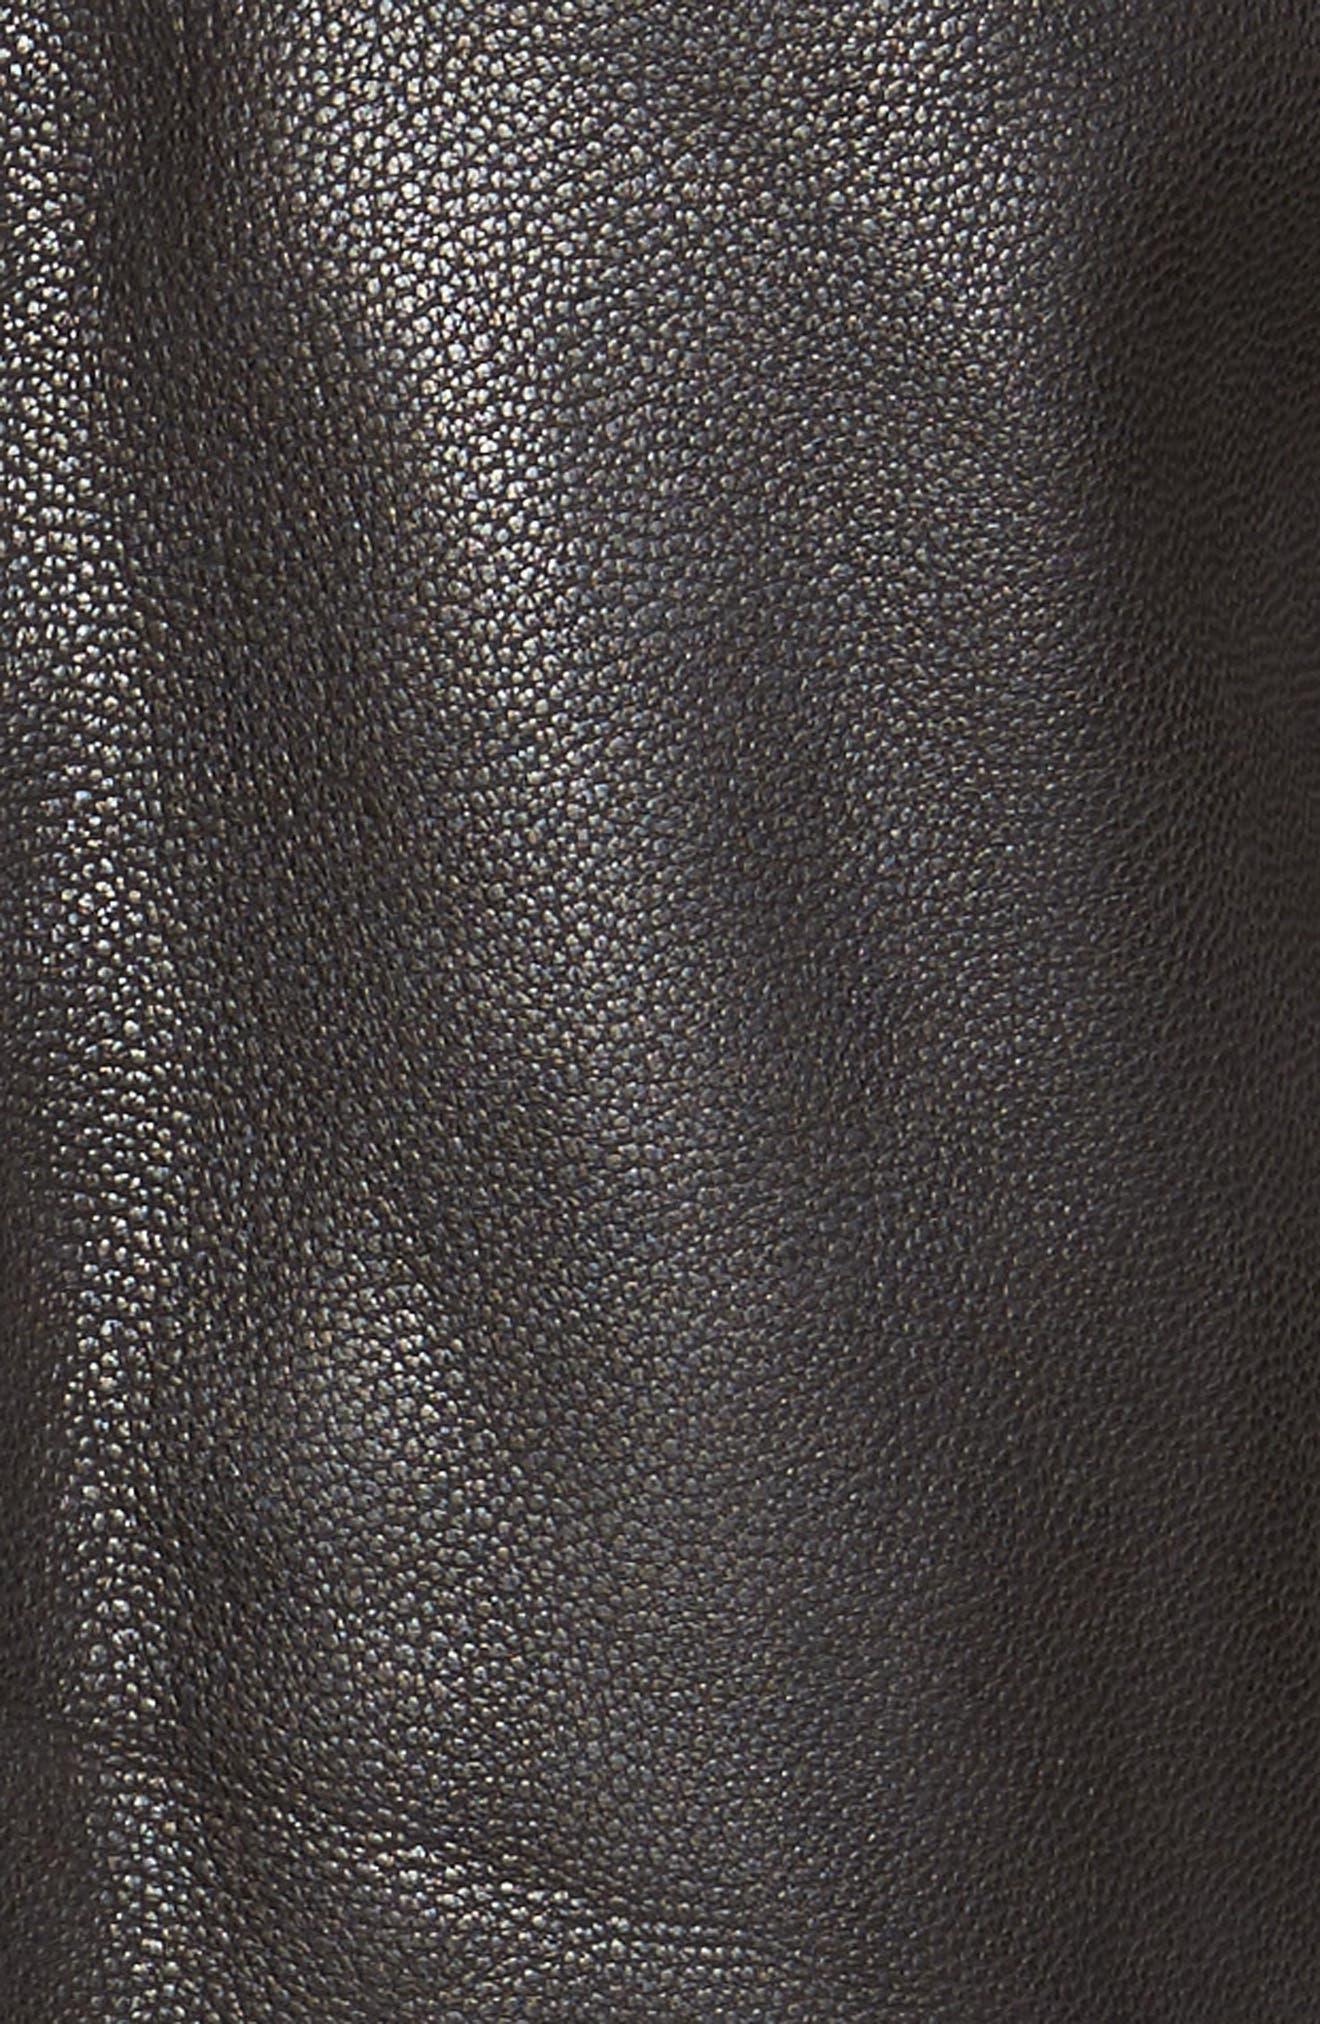 Washed Leather Trucker Jacket,                             Alternate thumbnail 6, color,                             BLACK